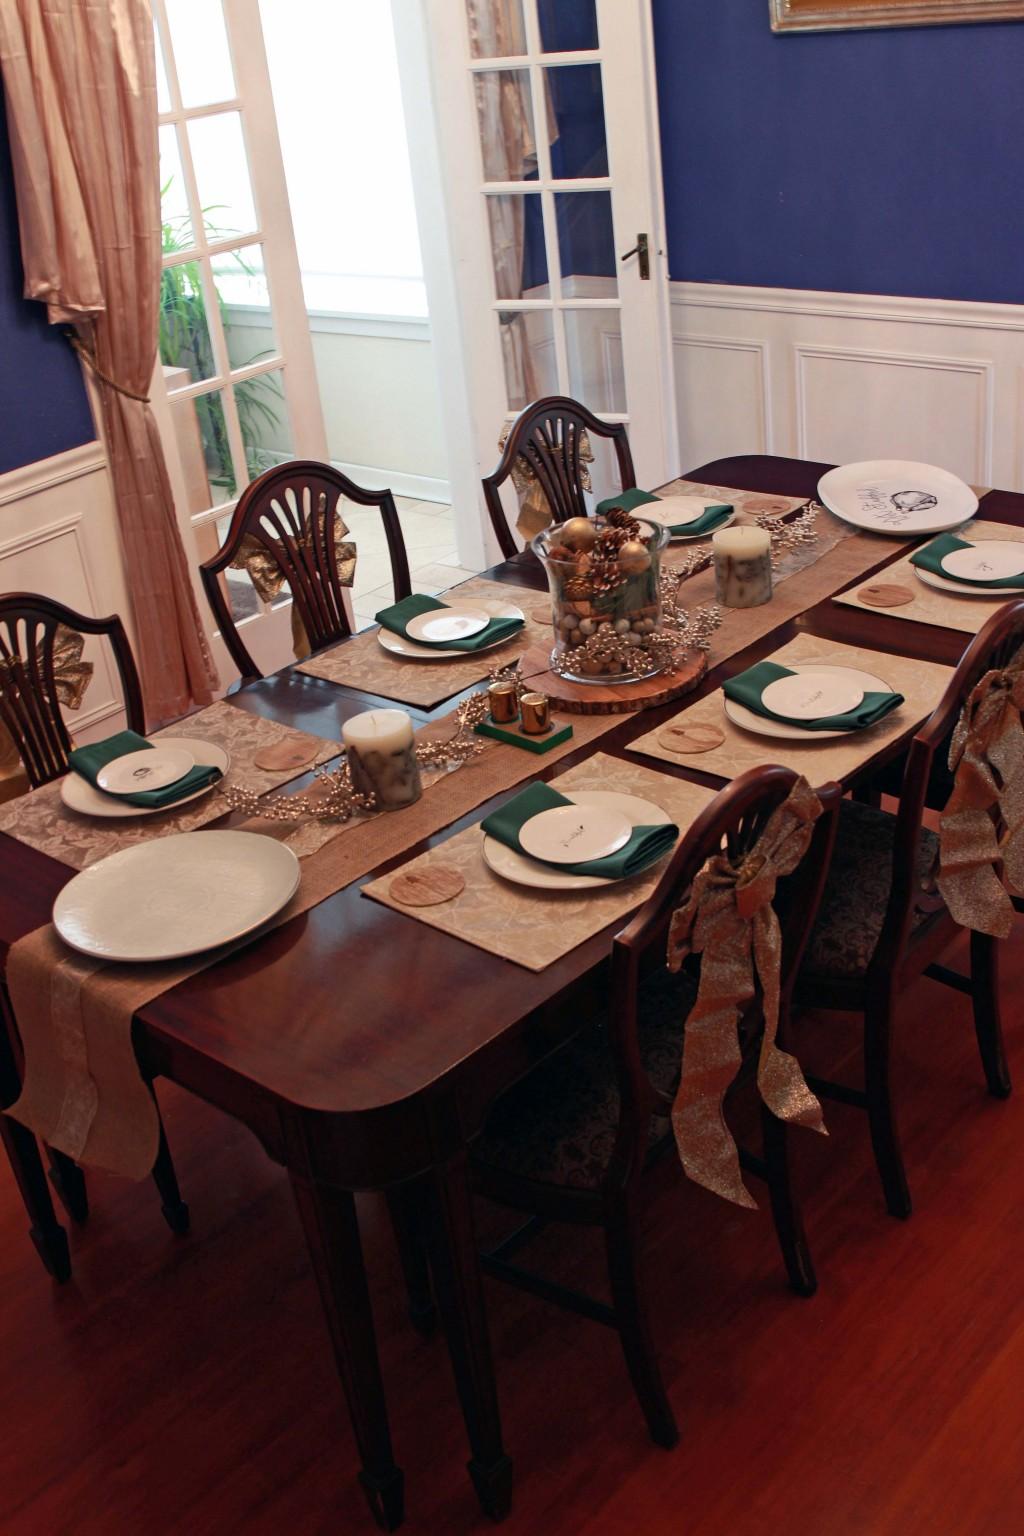 23-fall-tablescape-inspiration-historic-home